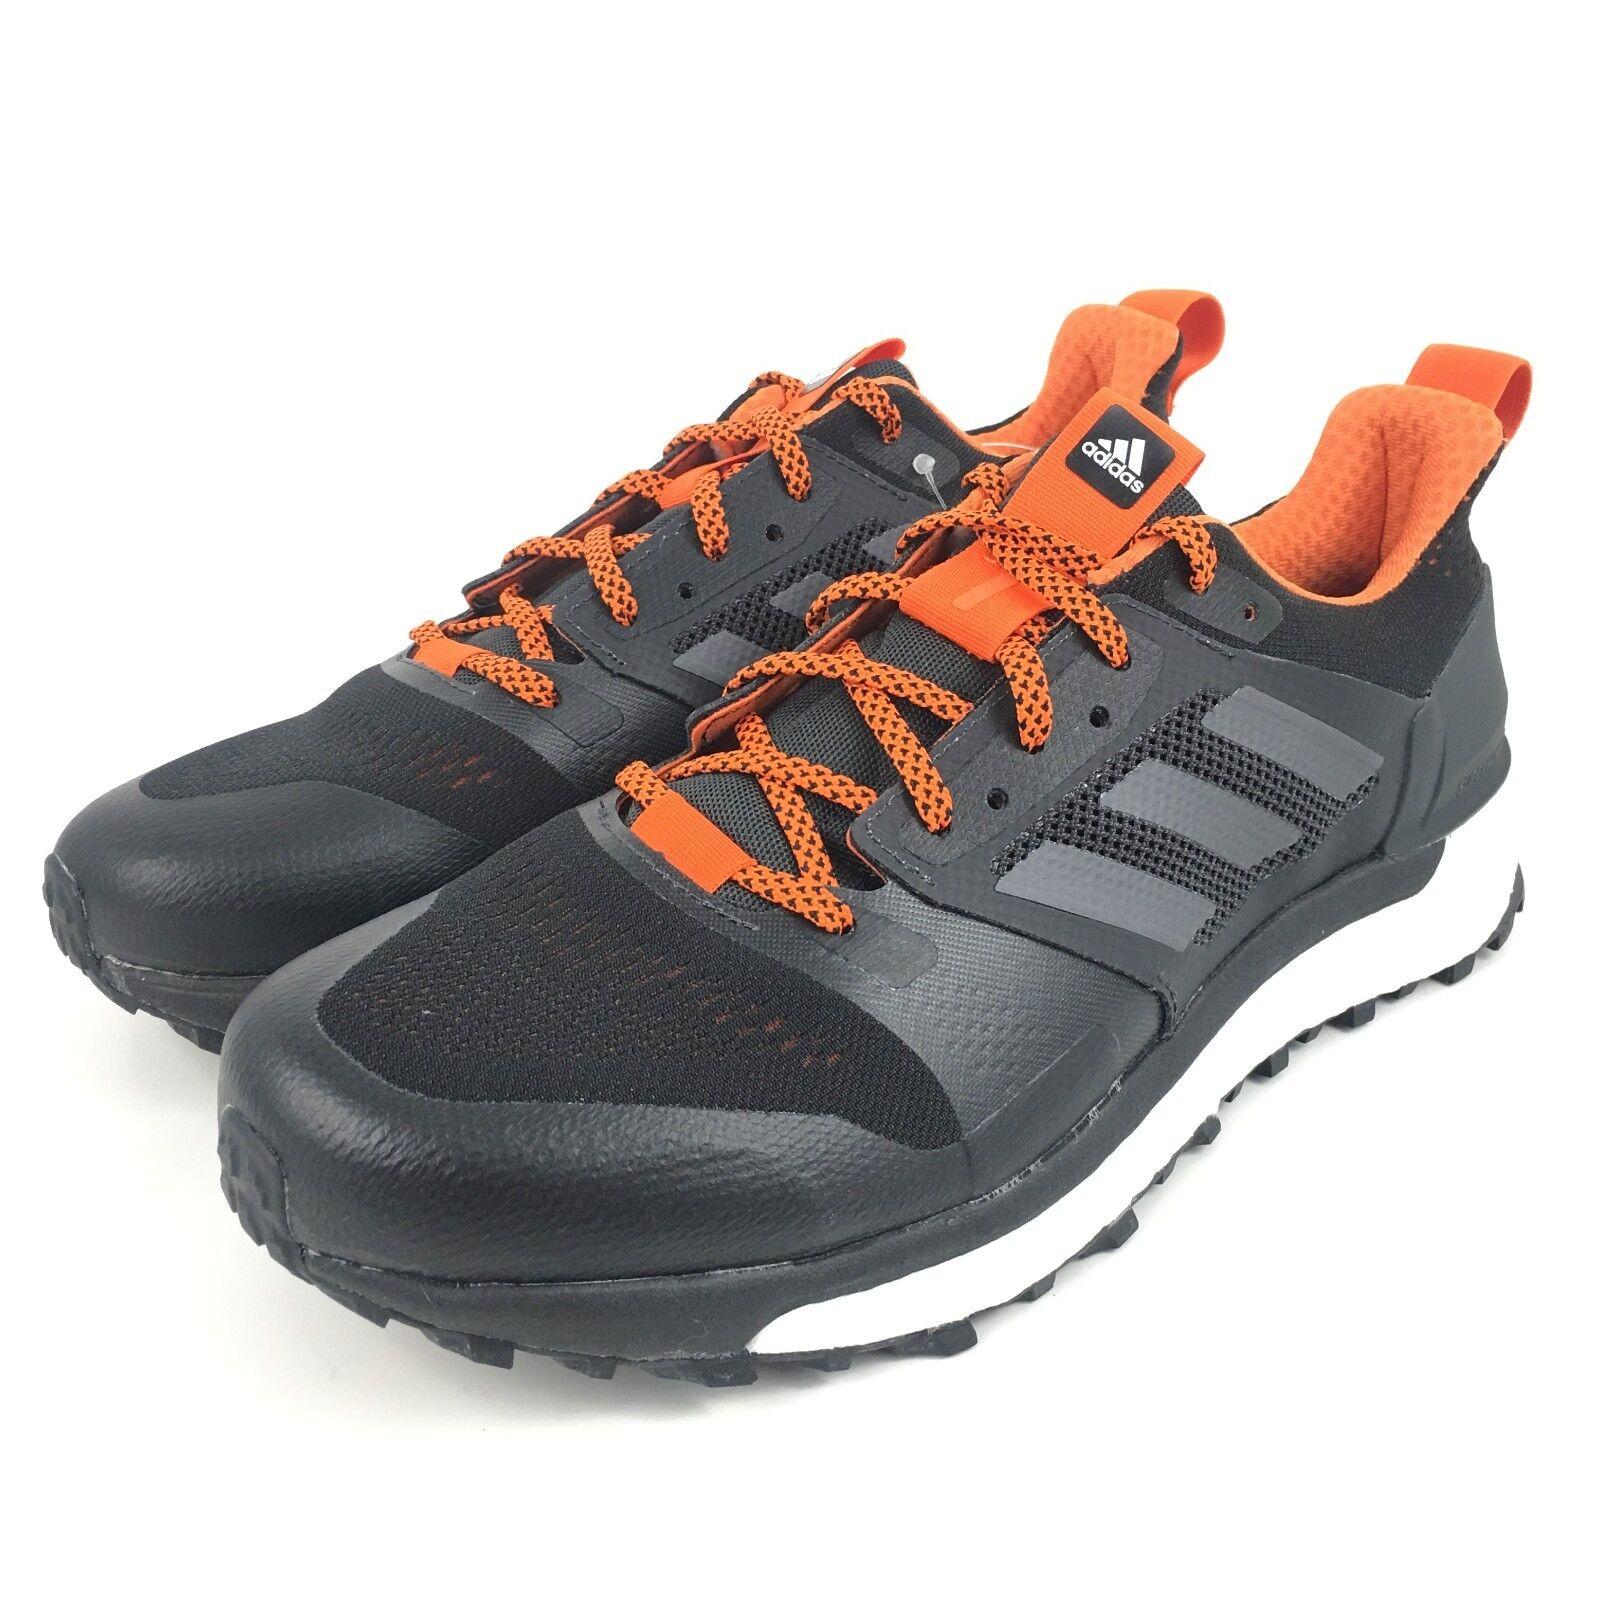 ac9c161ba6867 Adidas Supernova Boost Trail Running Running Running shoes Black Carbon Mens  Size 8 CG4025 6e0084